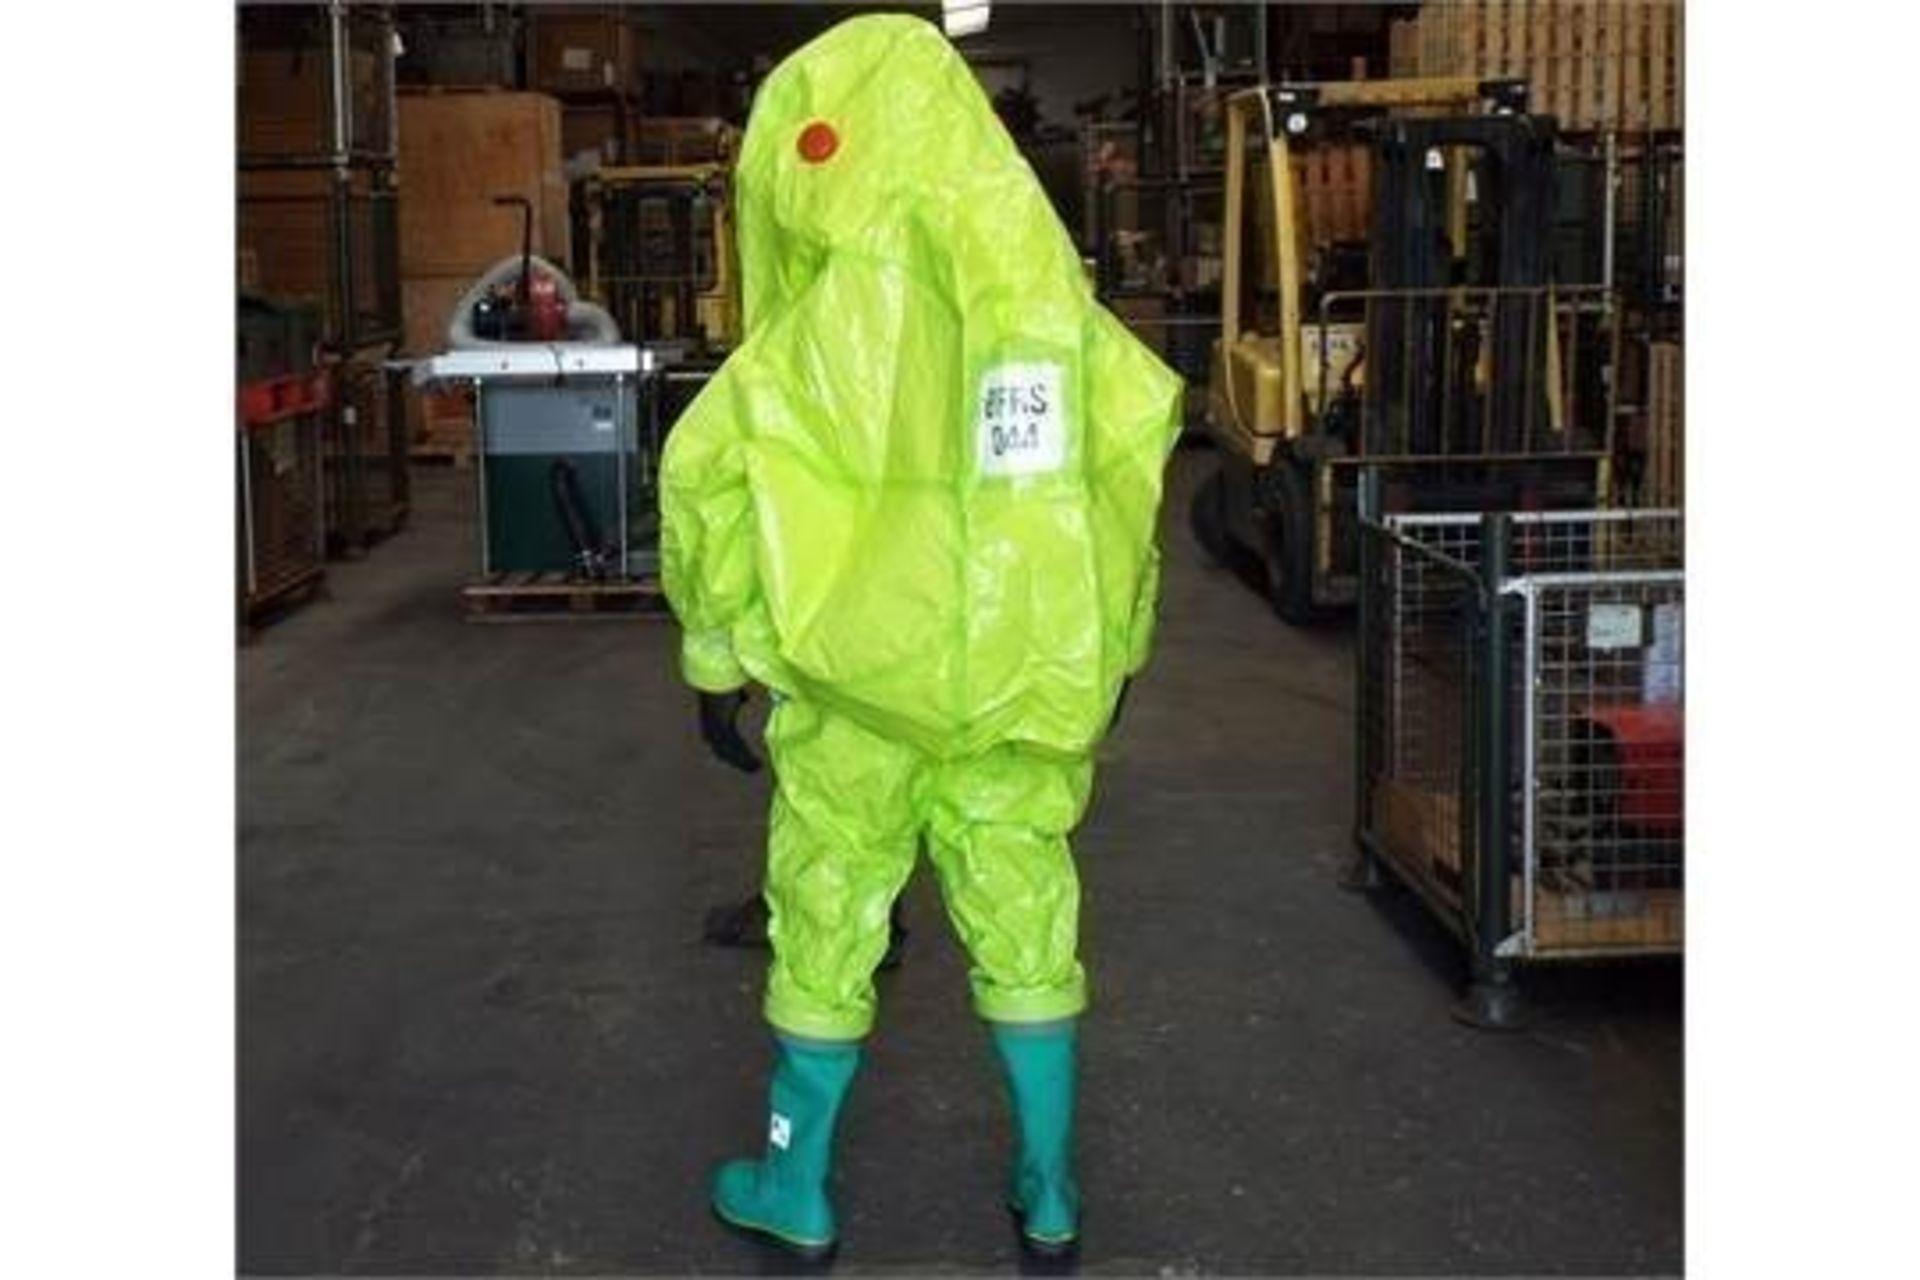 Lot 26804 - Q10 x Unissued Respirex Tychem TK Gas-Tight Hazmat Suit. Size Large